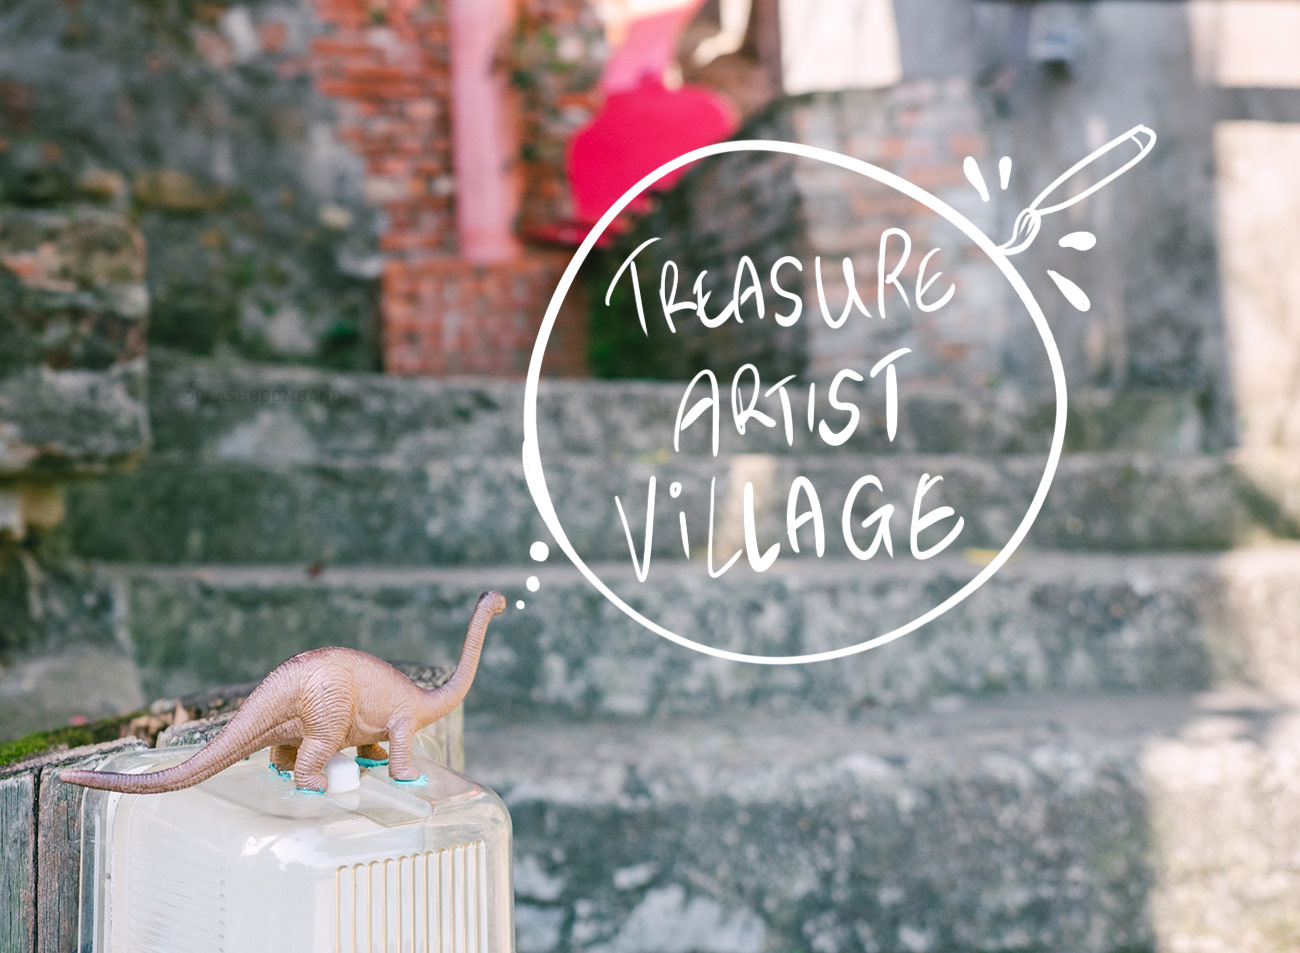 Treasure Hill Artist Village - Entrance with dinosaur